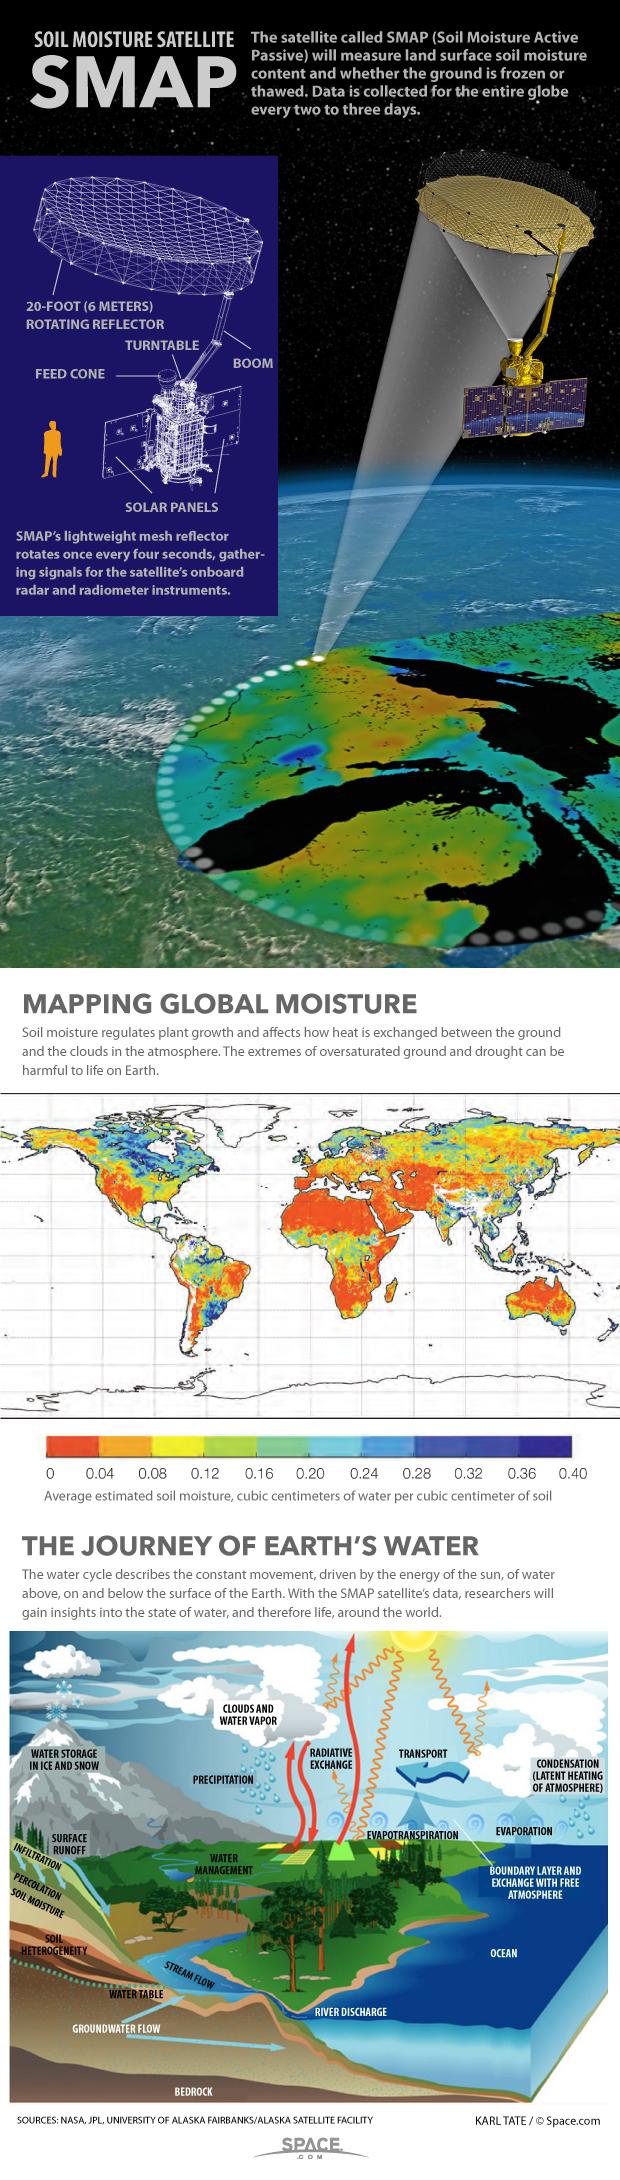 How NASA's Soil Moisture Satellite Works (Infographic)